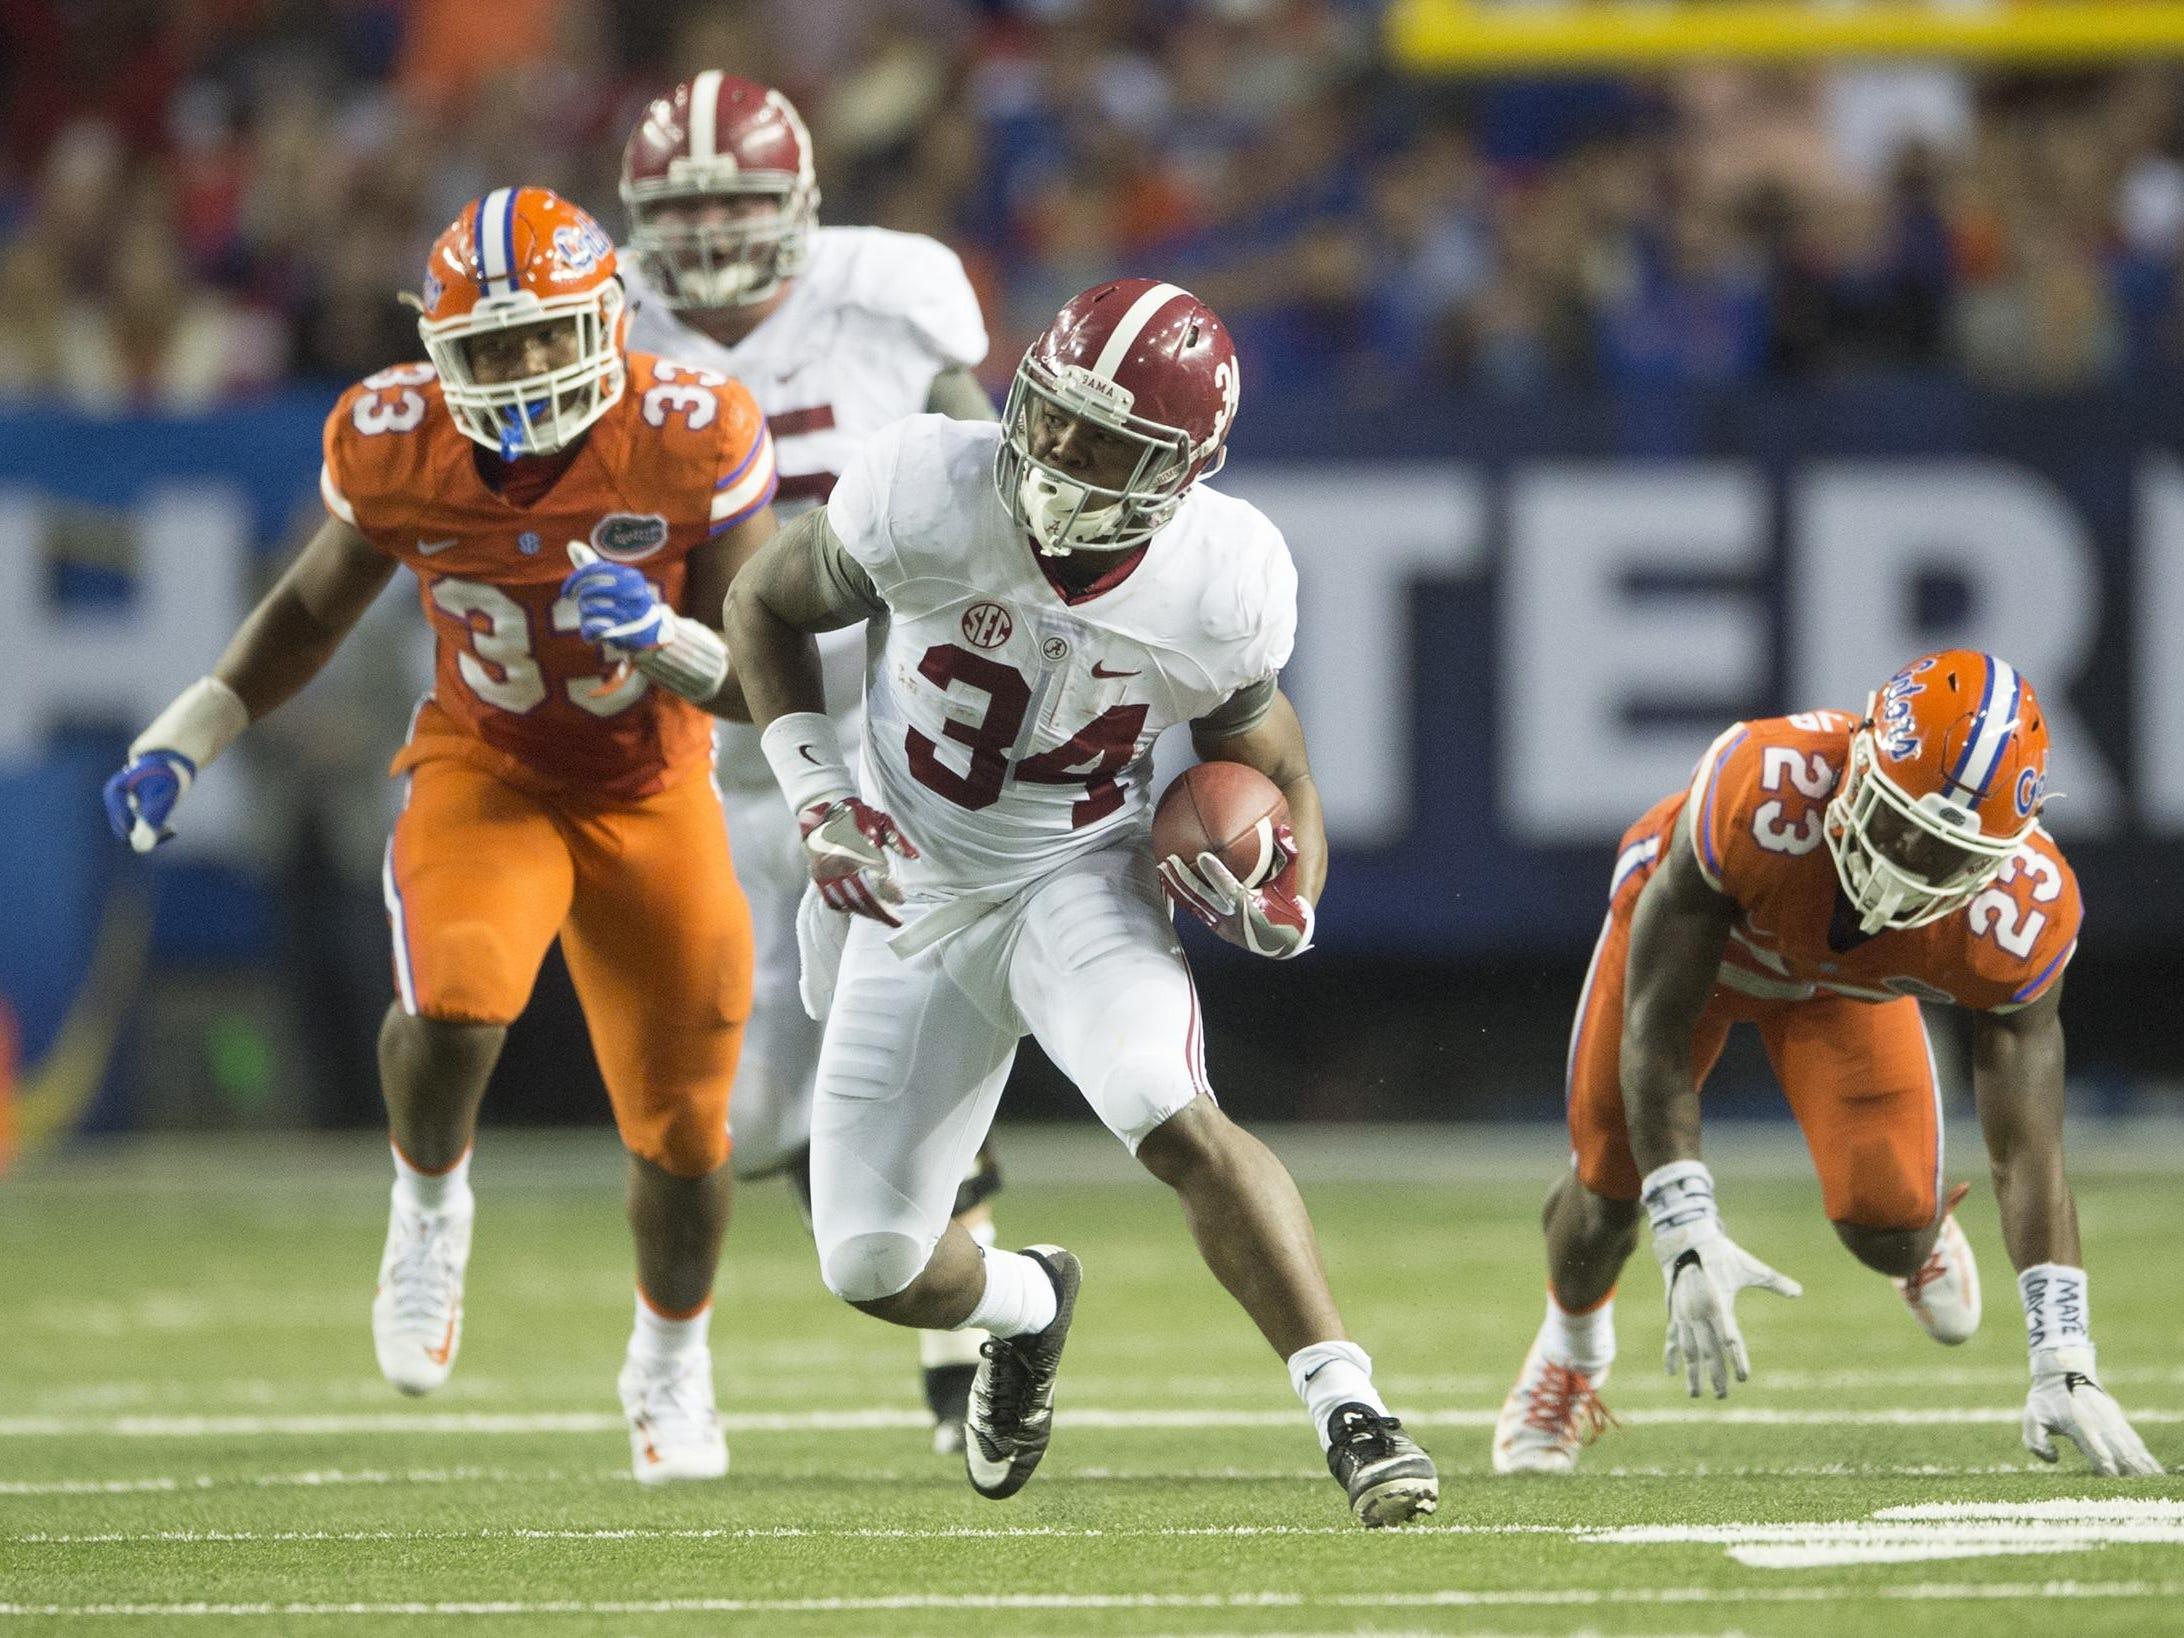 Alabama running back Damien Harris (34) runs downfield during the SEC Championship football game between Alabama and Florida on Saturday, Dec. 3, 2016, in Atlanta, Ga. Alabama defeated Florida 54-16.